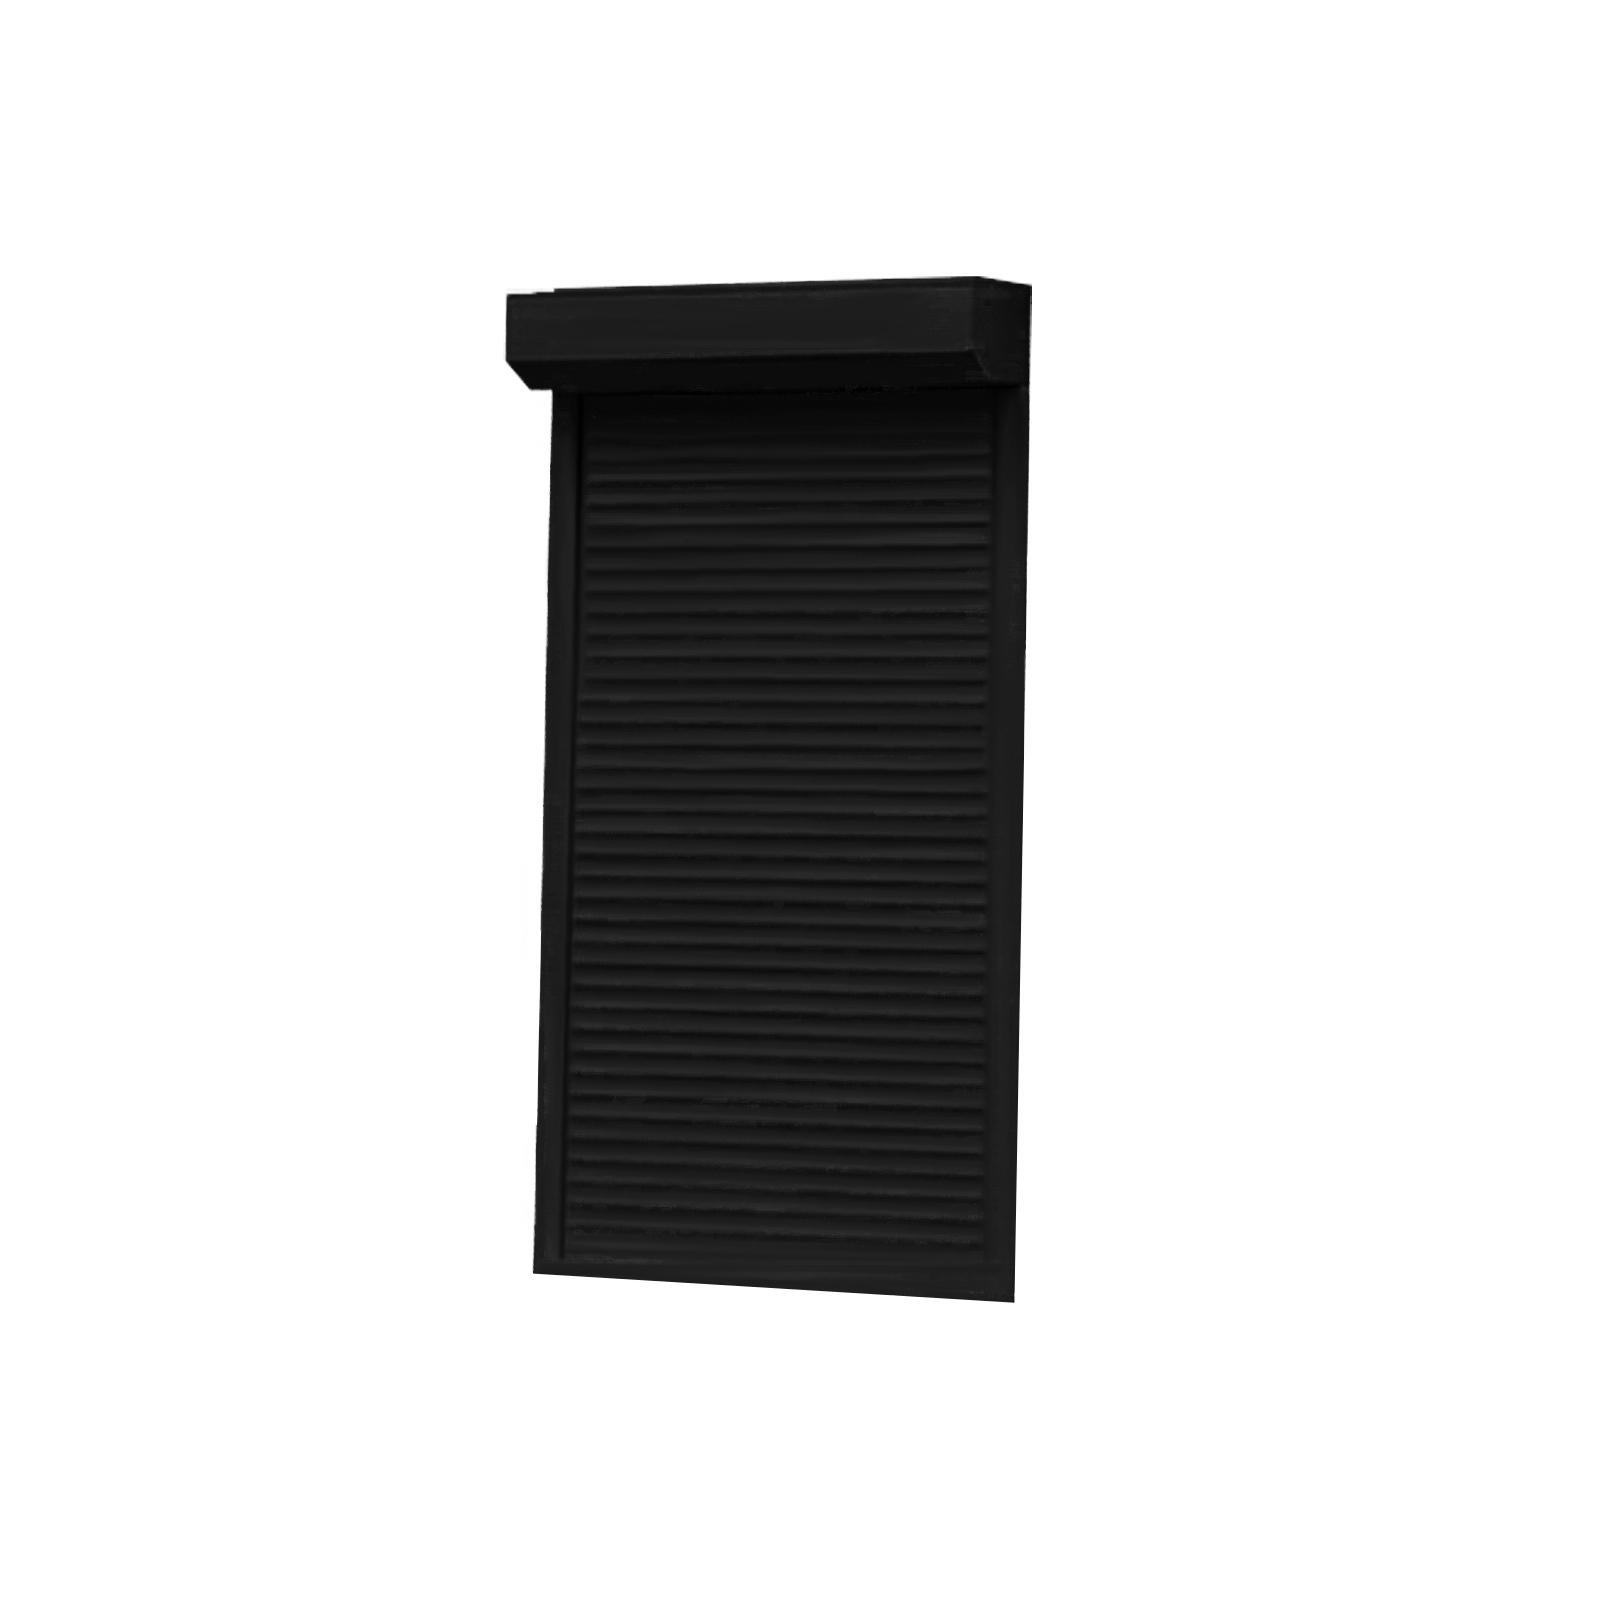 Everton 2001-2200mm H x 1401-1600mm W On-Wall Battery Roller Shutter